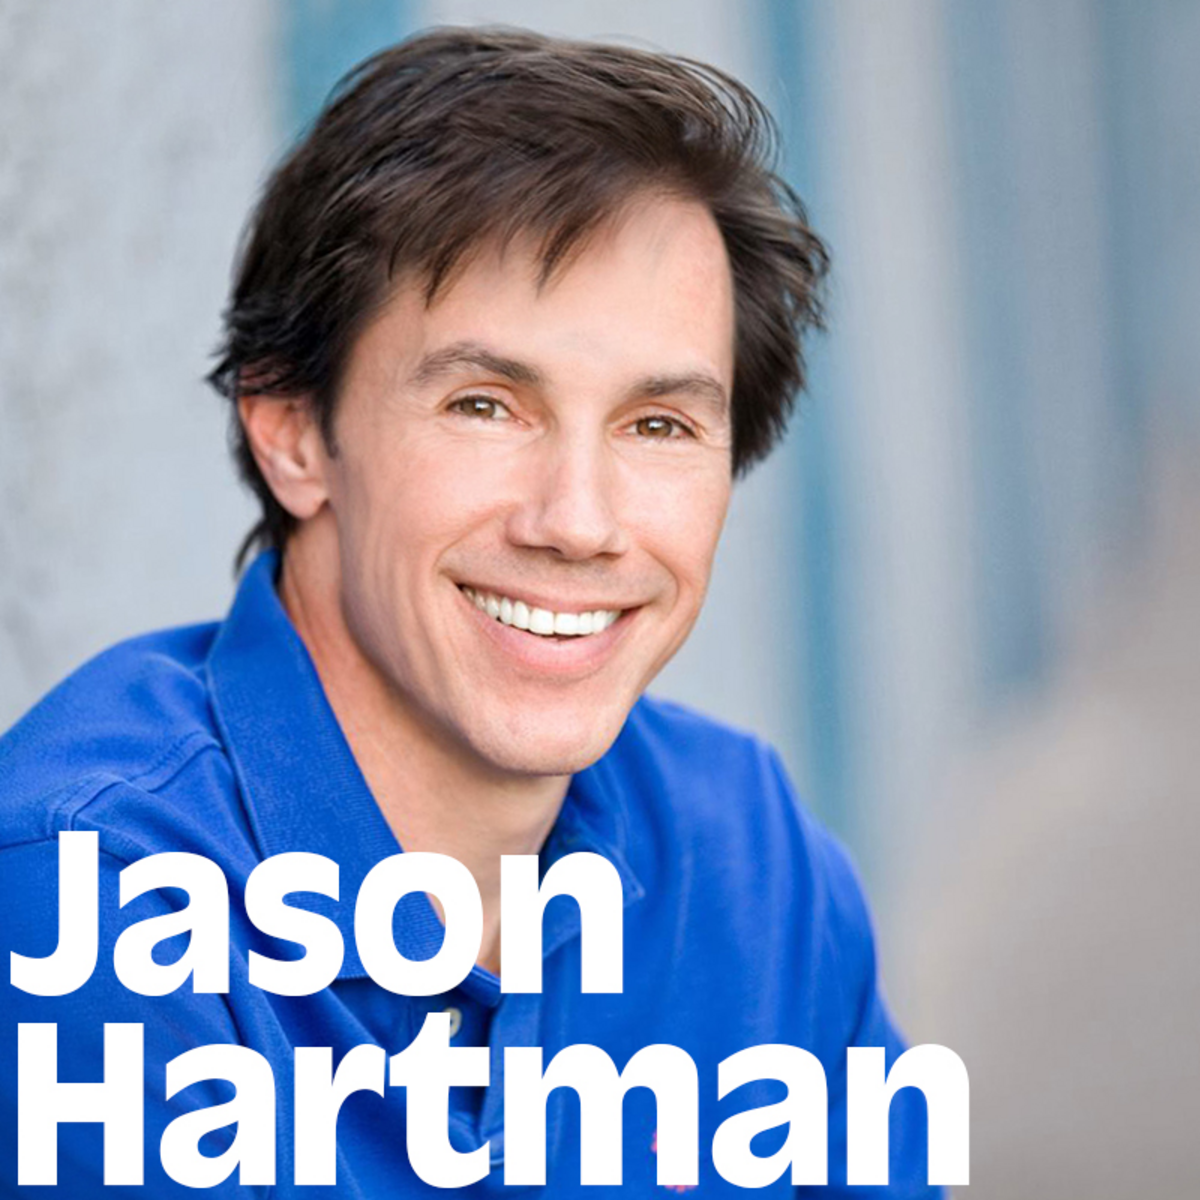 Professional Spotlight: Jason Hartman